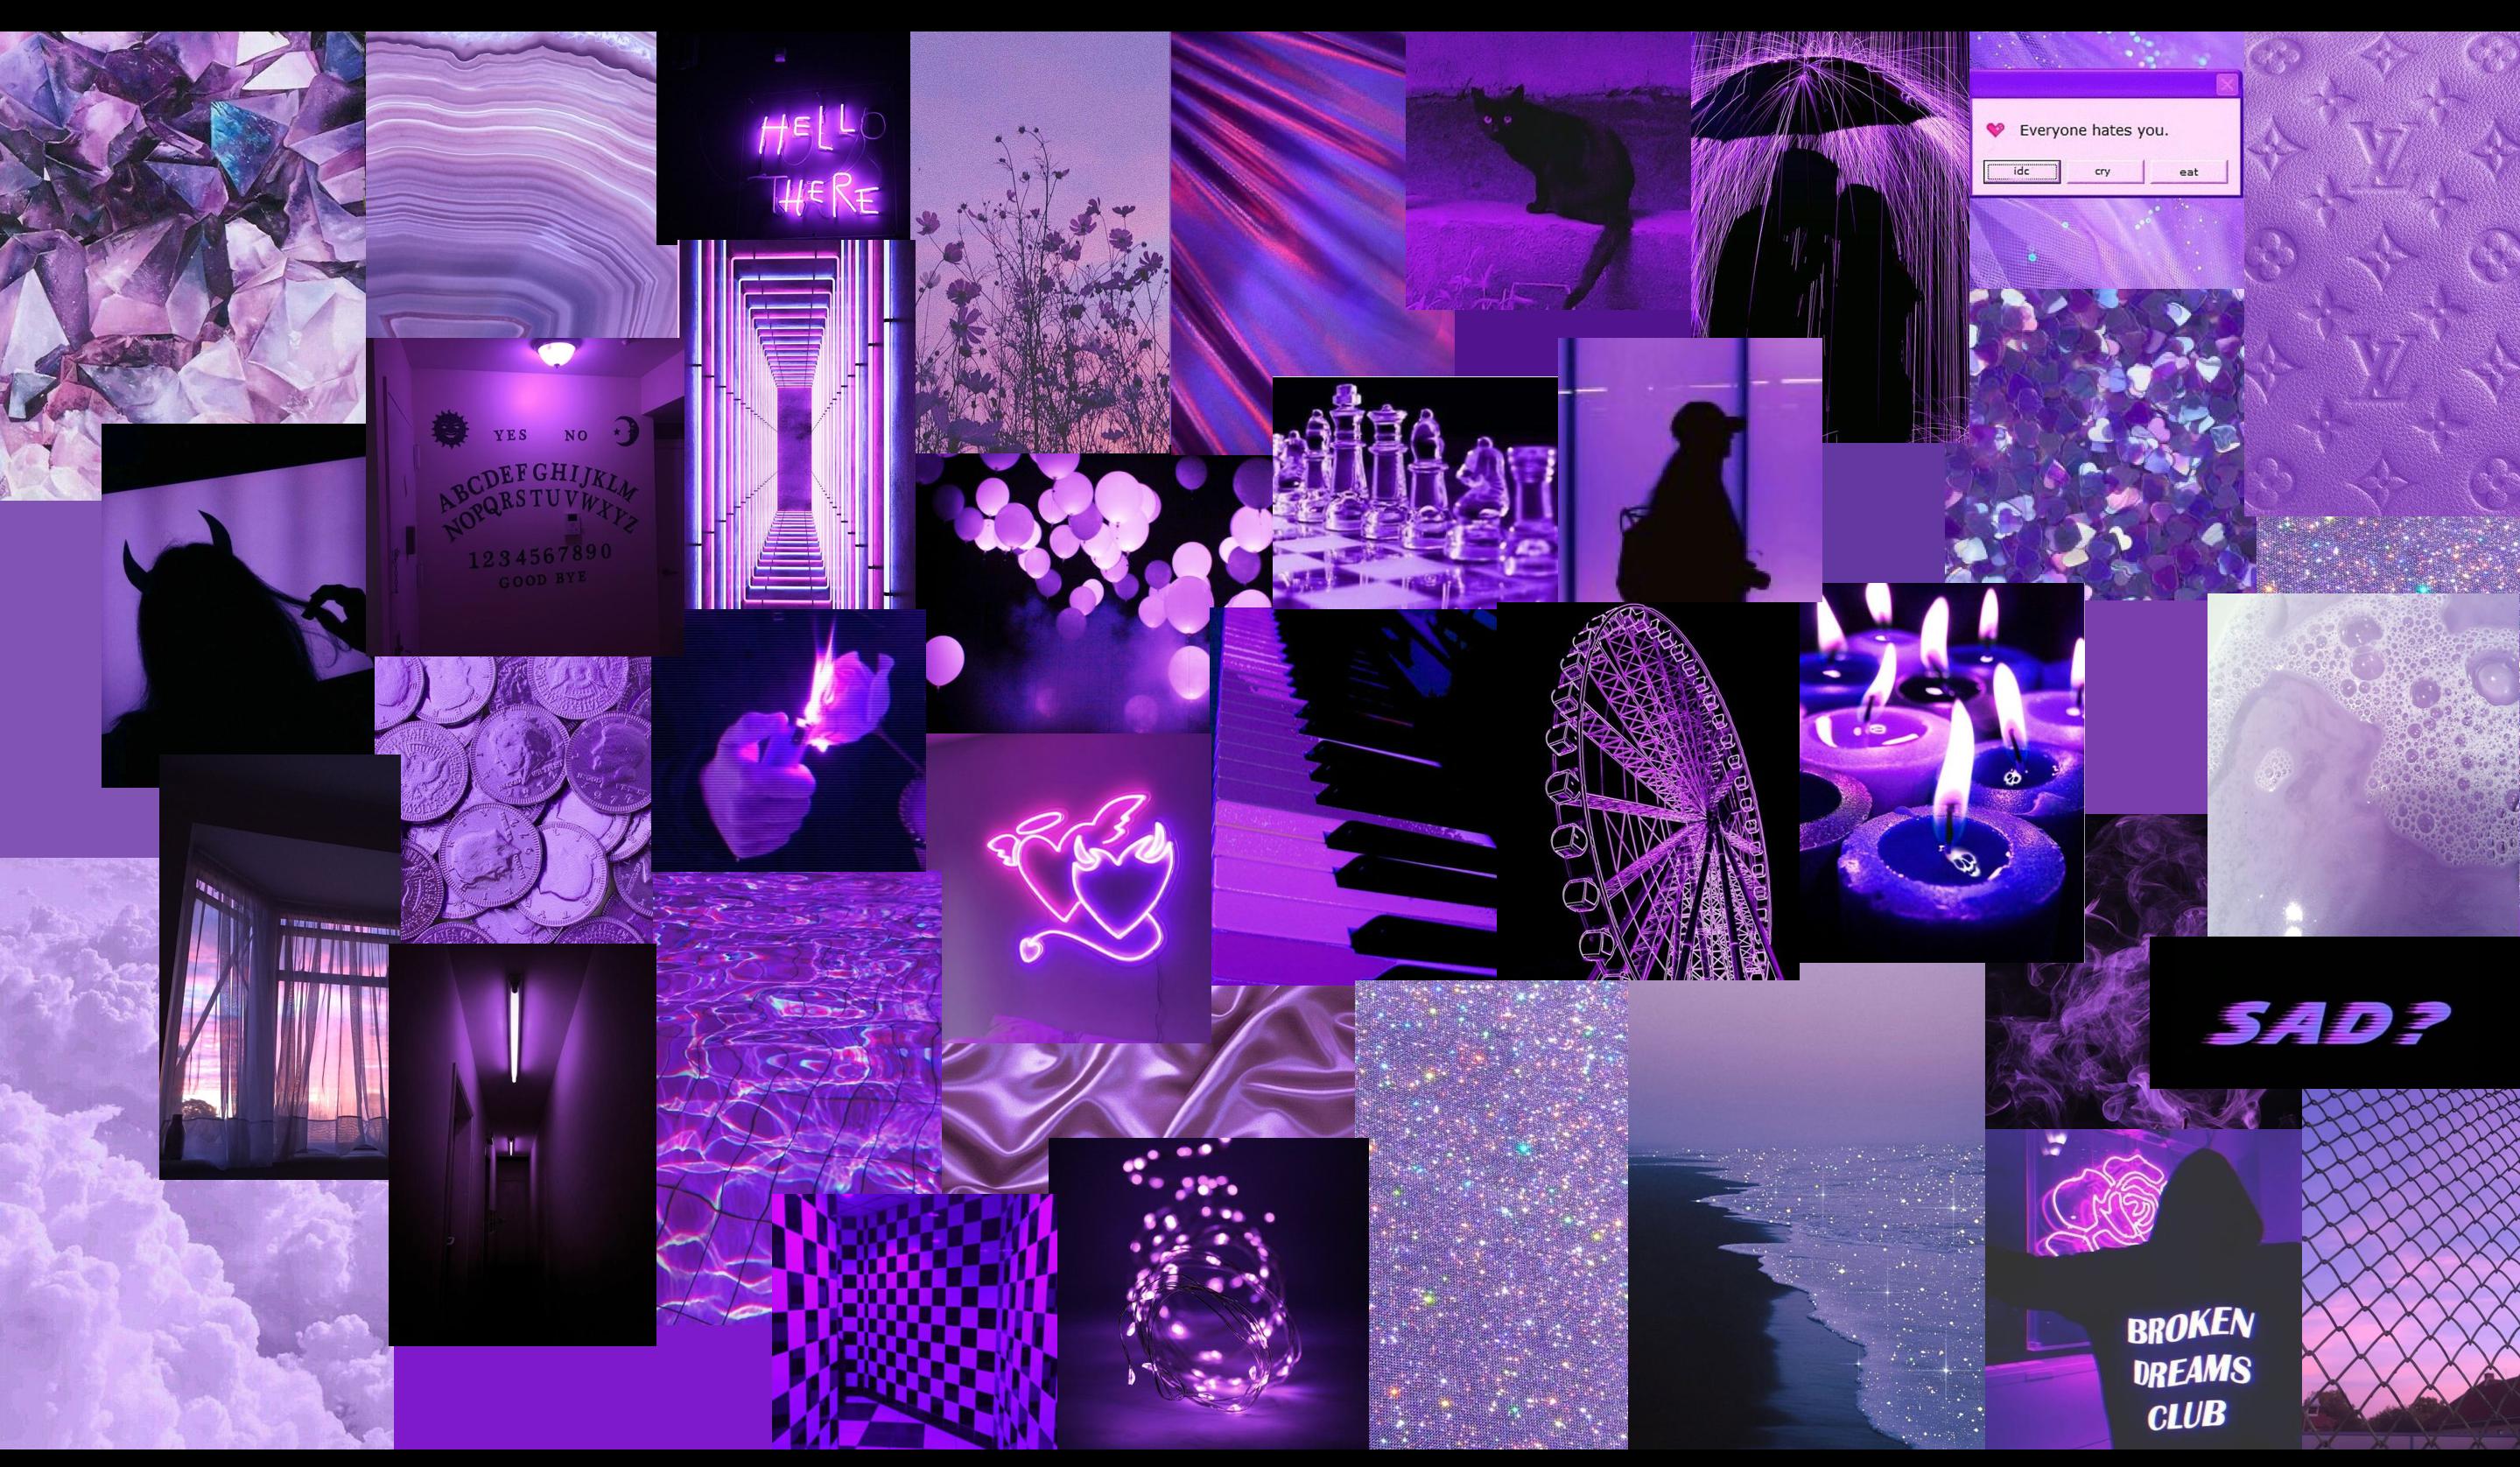 Purple Collage Aesthetic Desktop Wallpaper Macbook Wallpaper Laptop Wallpaper